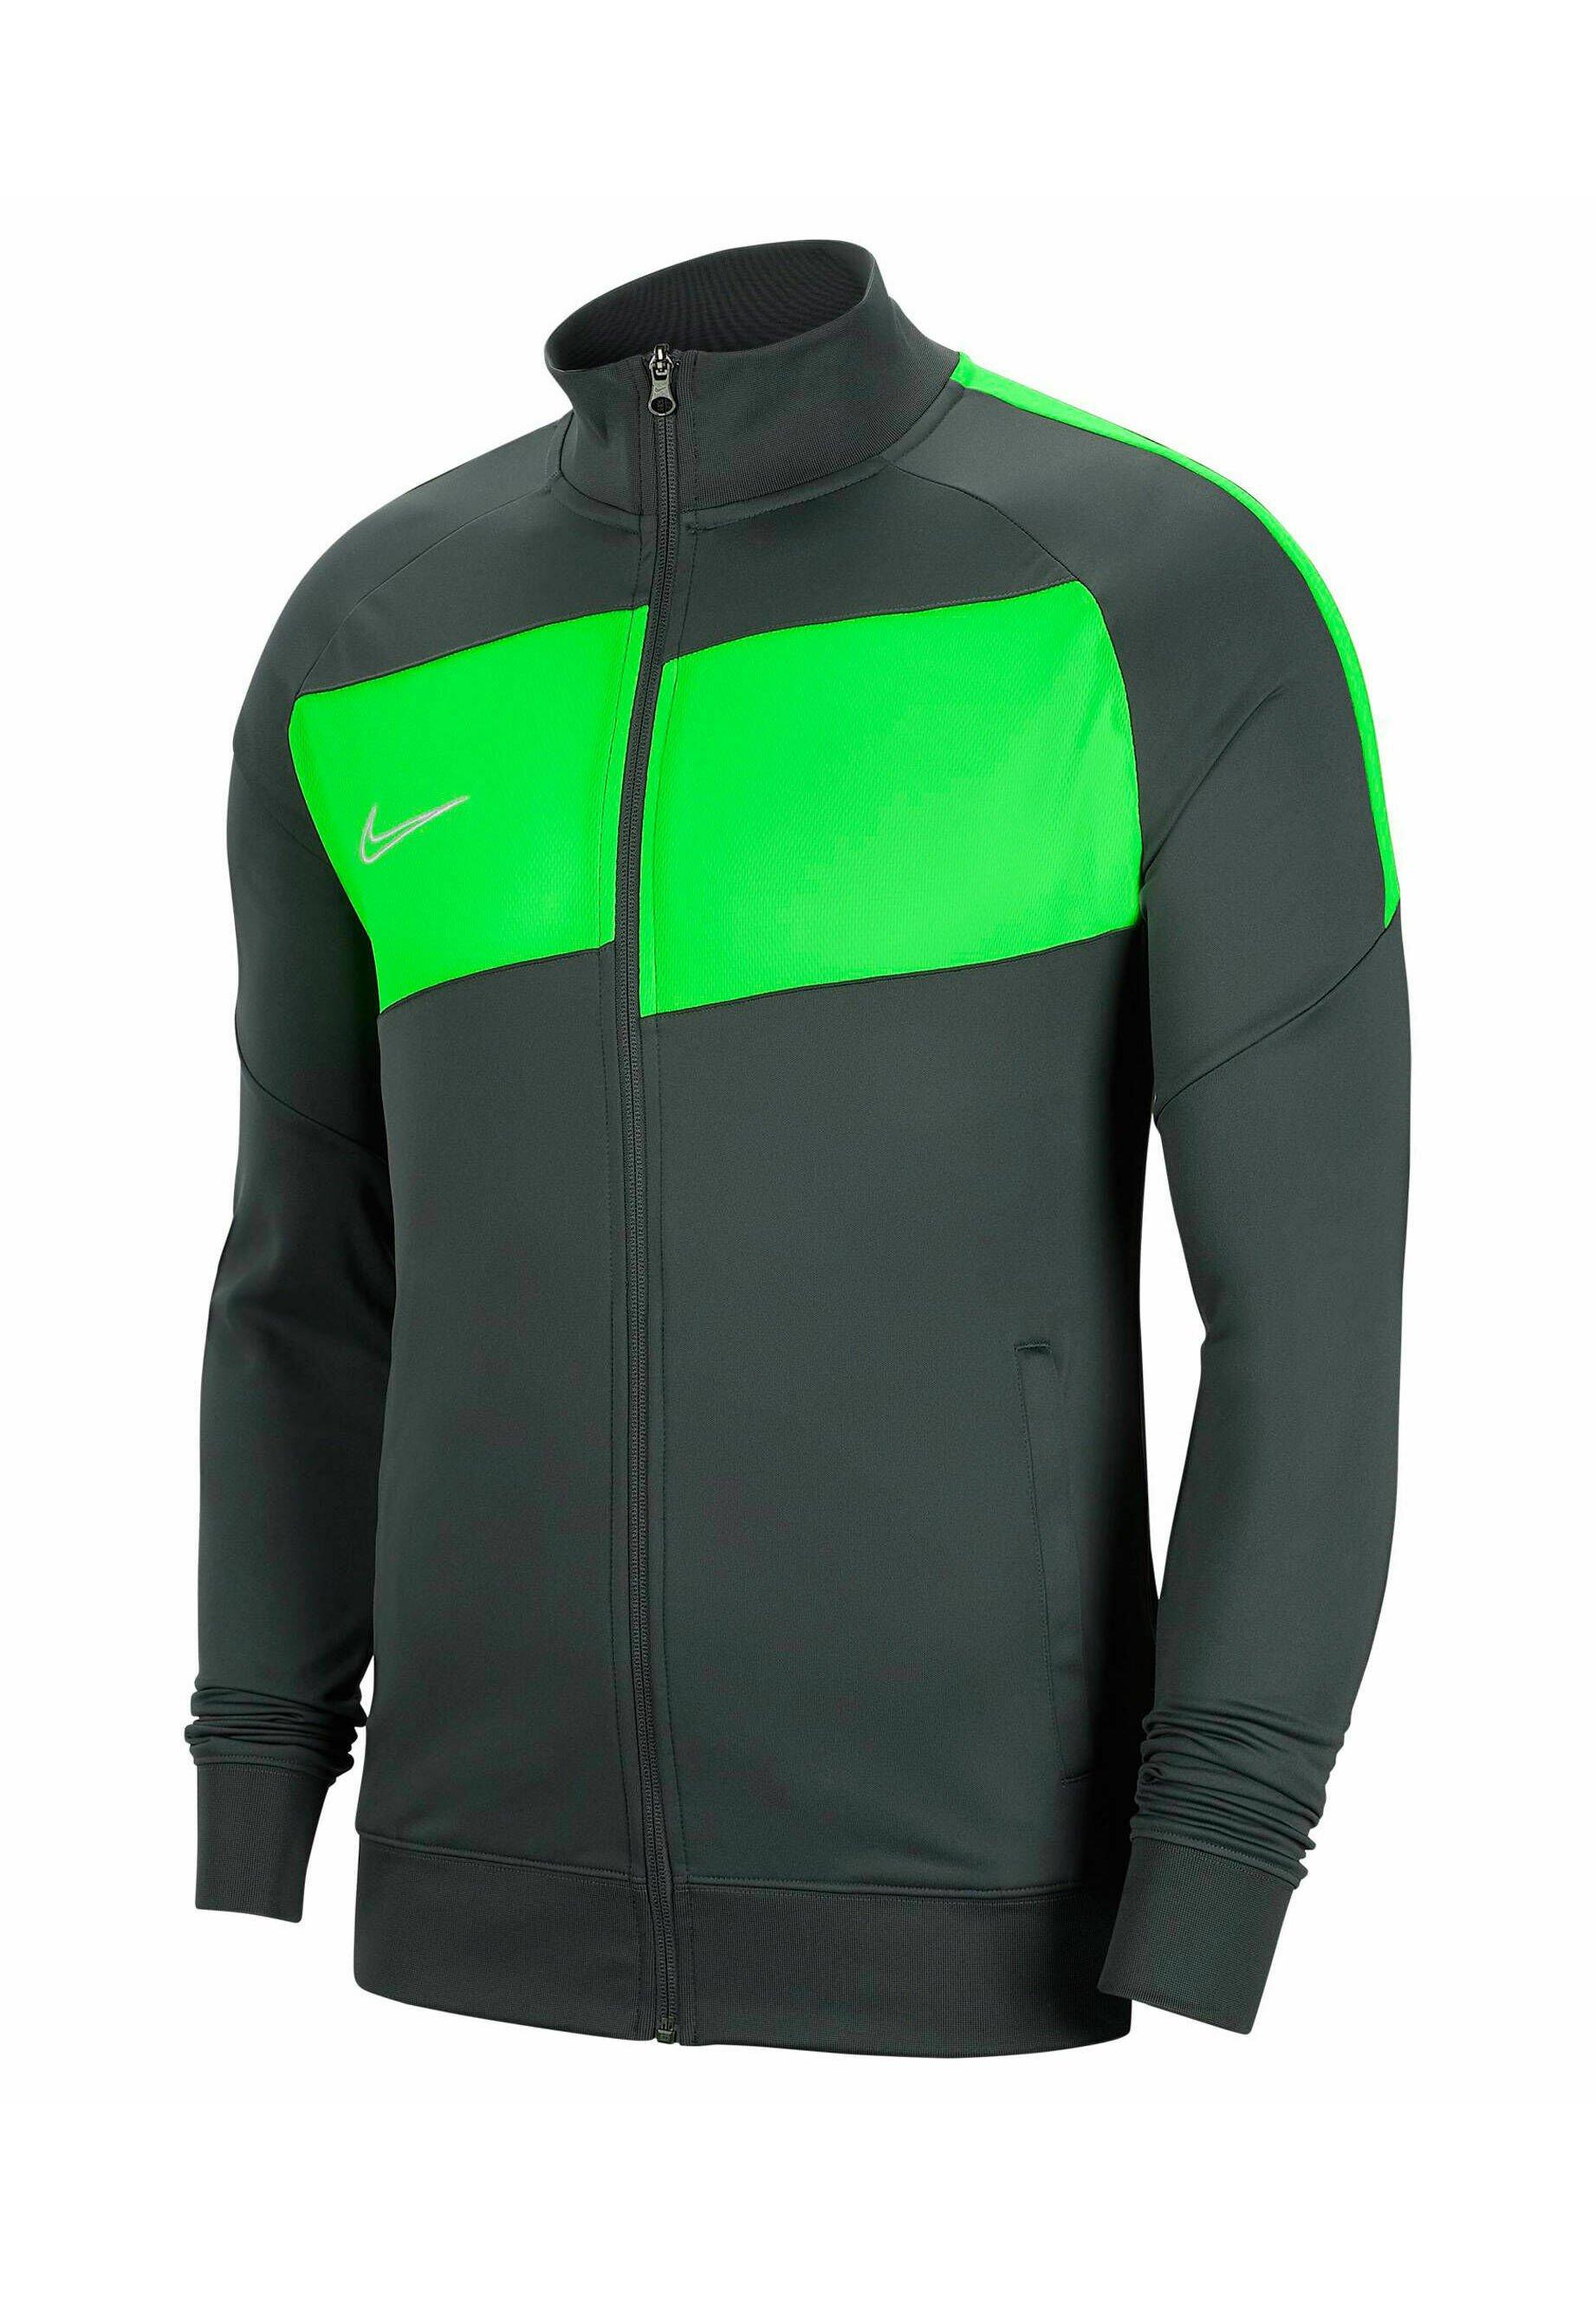 Uomo DRY ACADEMY PRO - Giacca sportiva - grau/grün